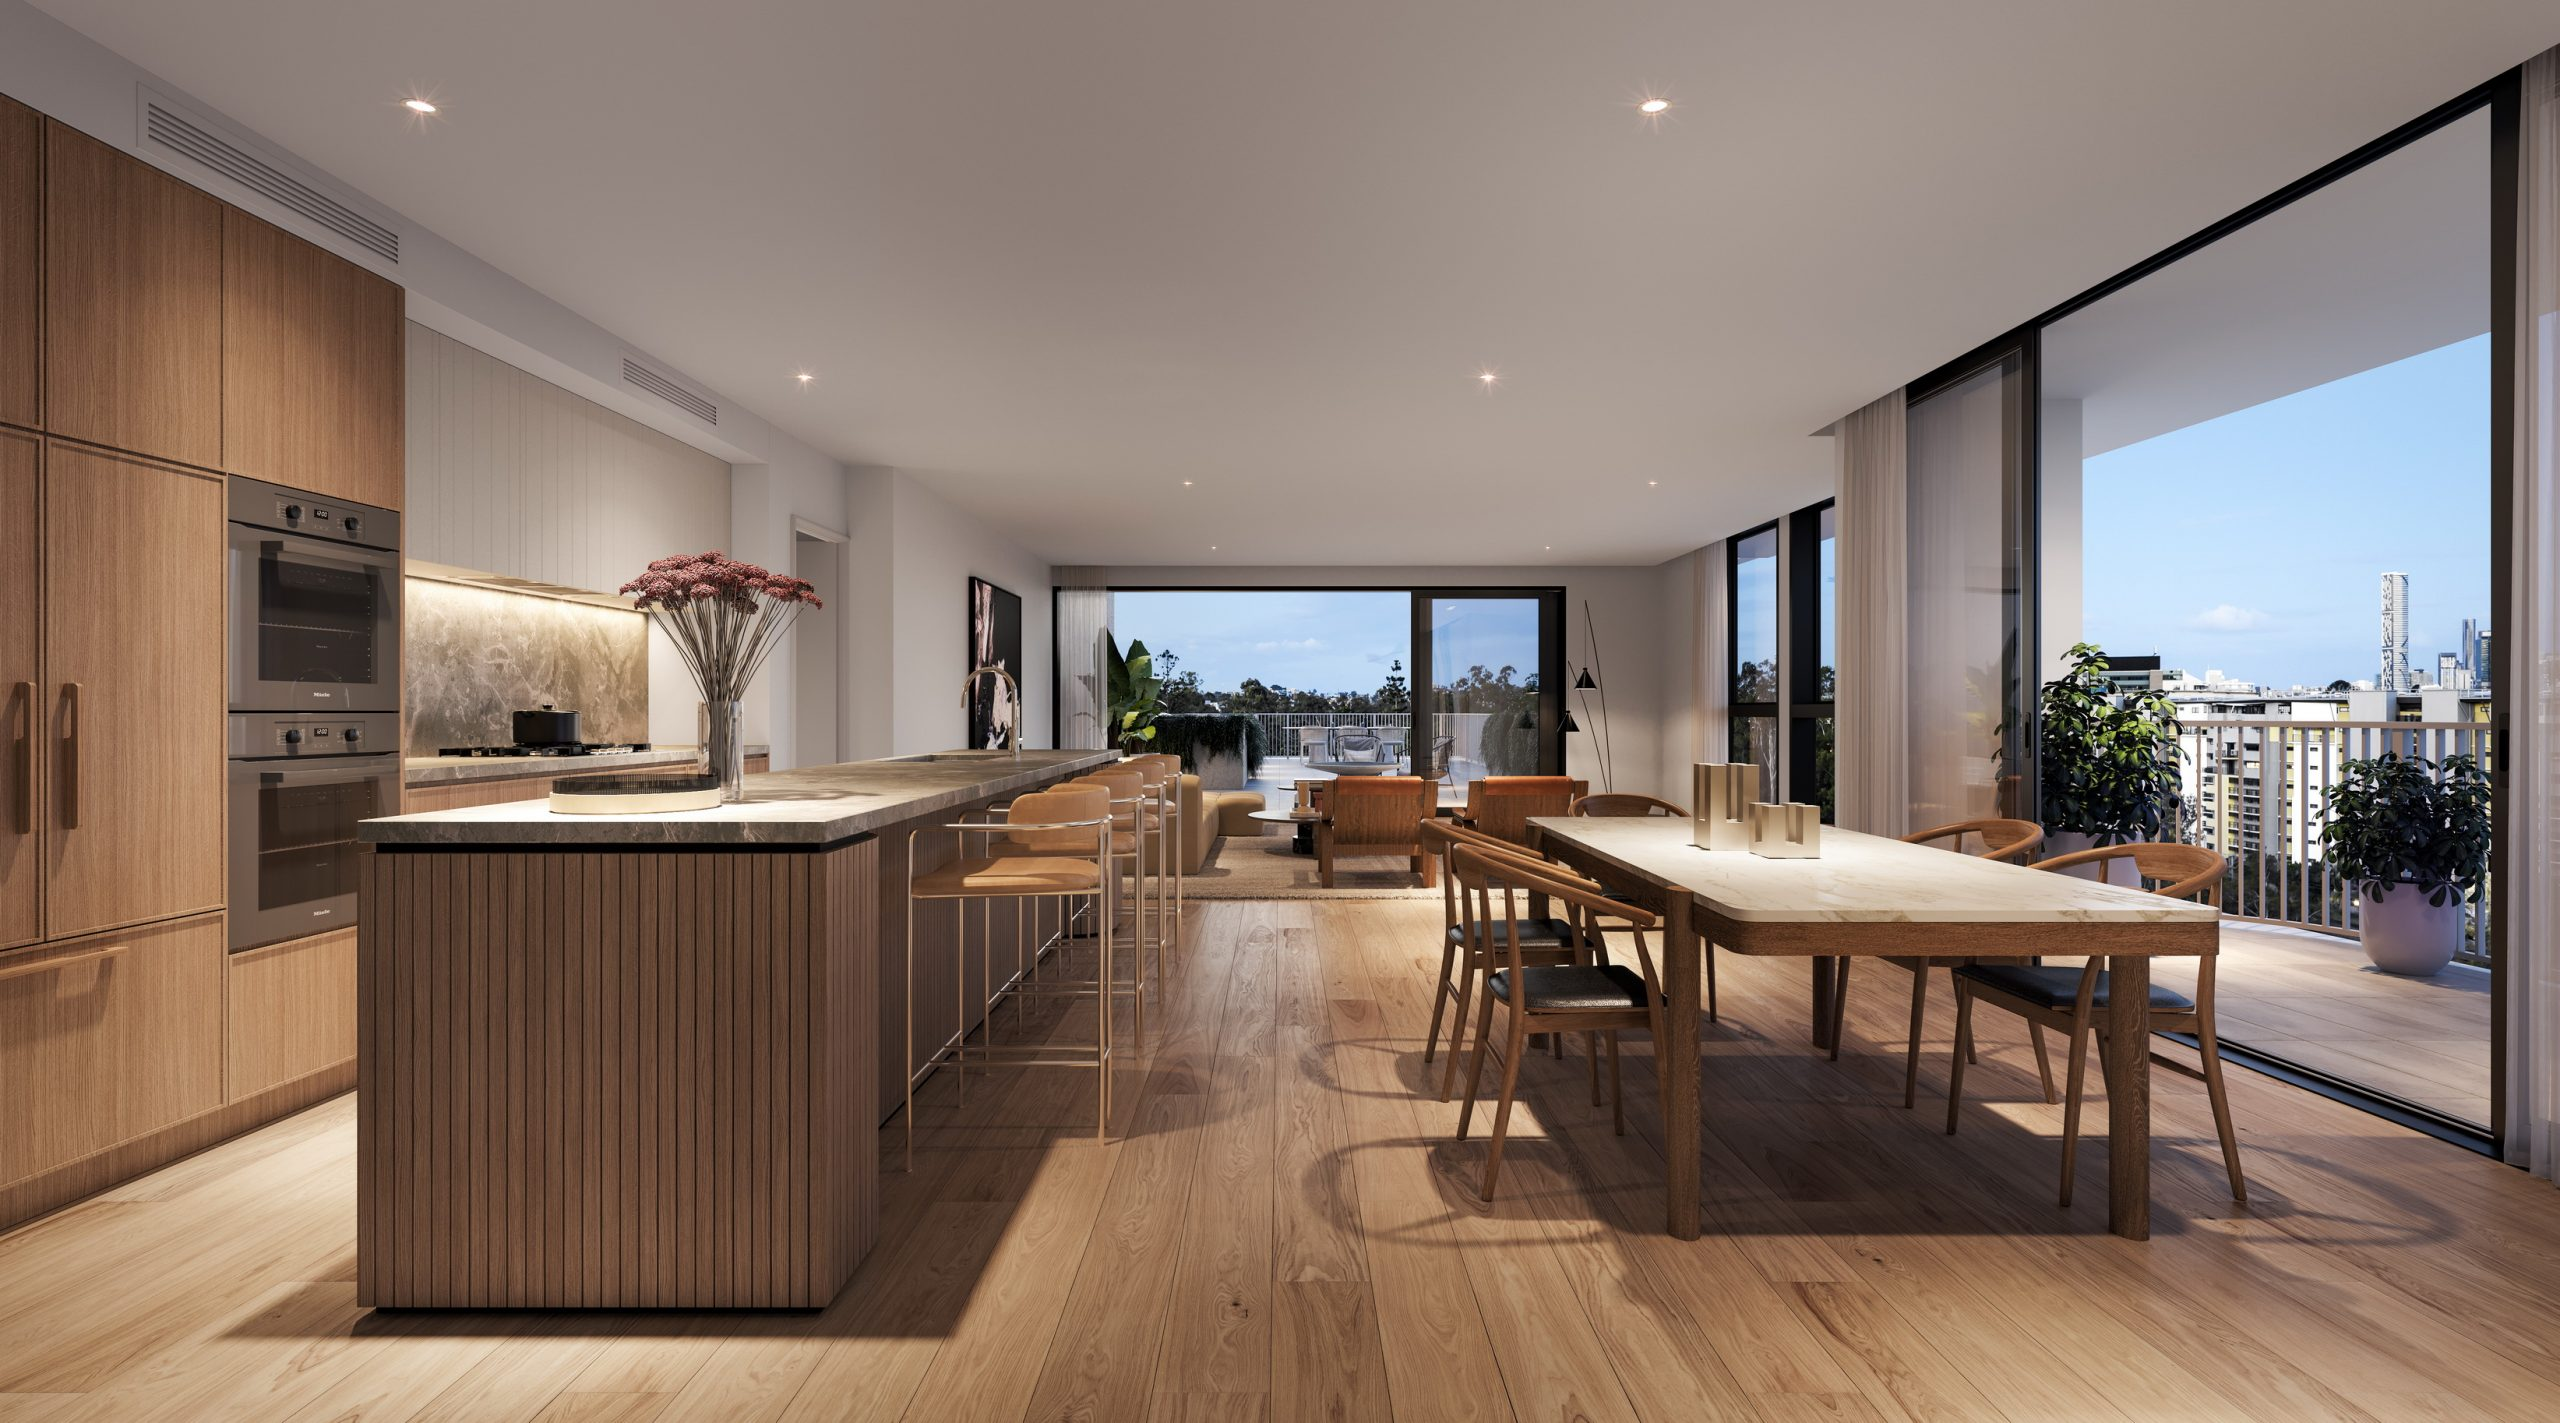 Fkd-studio-kensington-toowong-mermaid-beach-mosaic-property-render-3d-interior-kitchen-living-penthouse